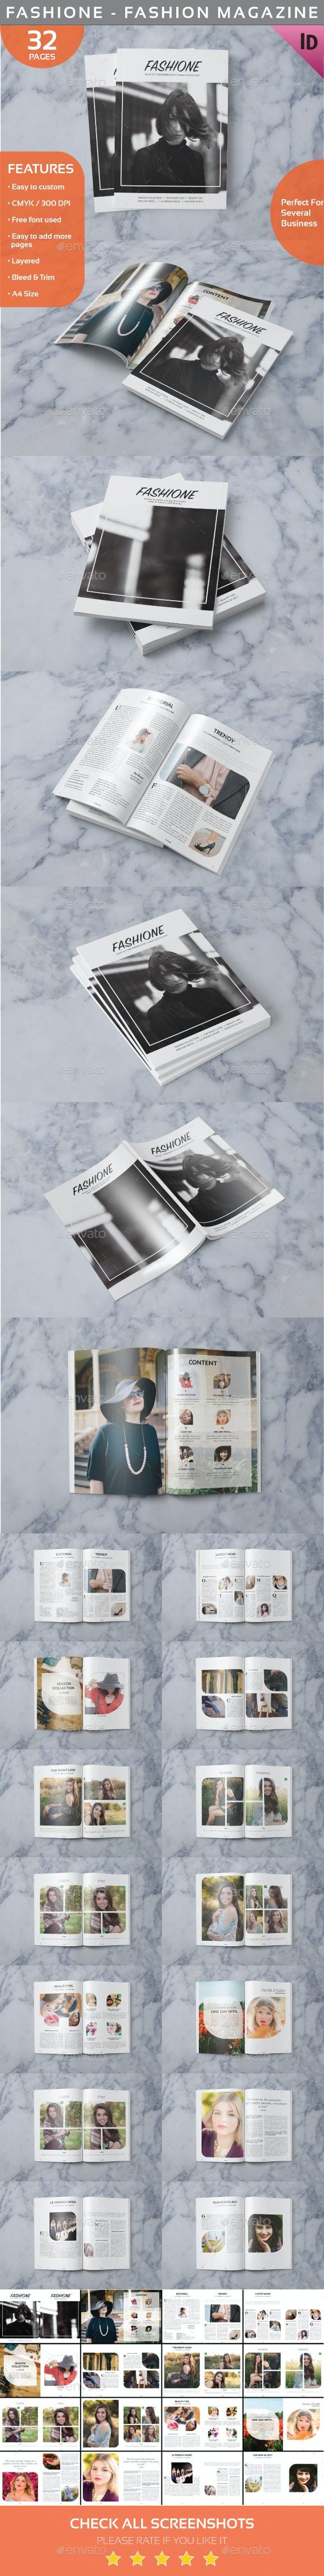 Fashione - Indesign Fashion Magazine Template - Magazines Print Templates